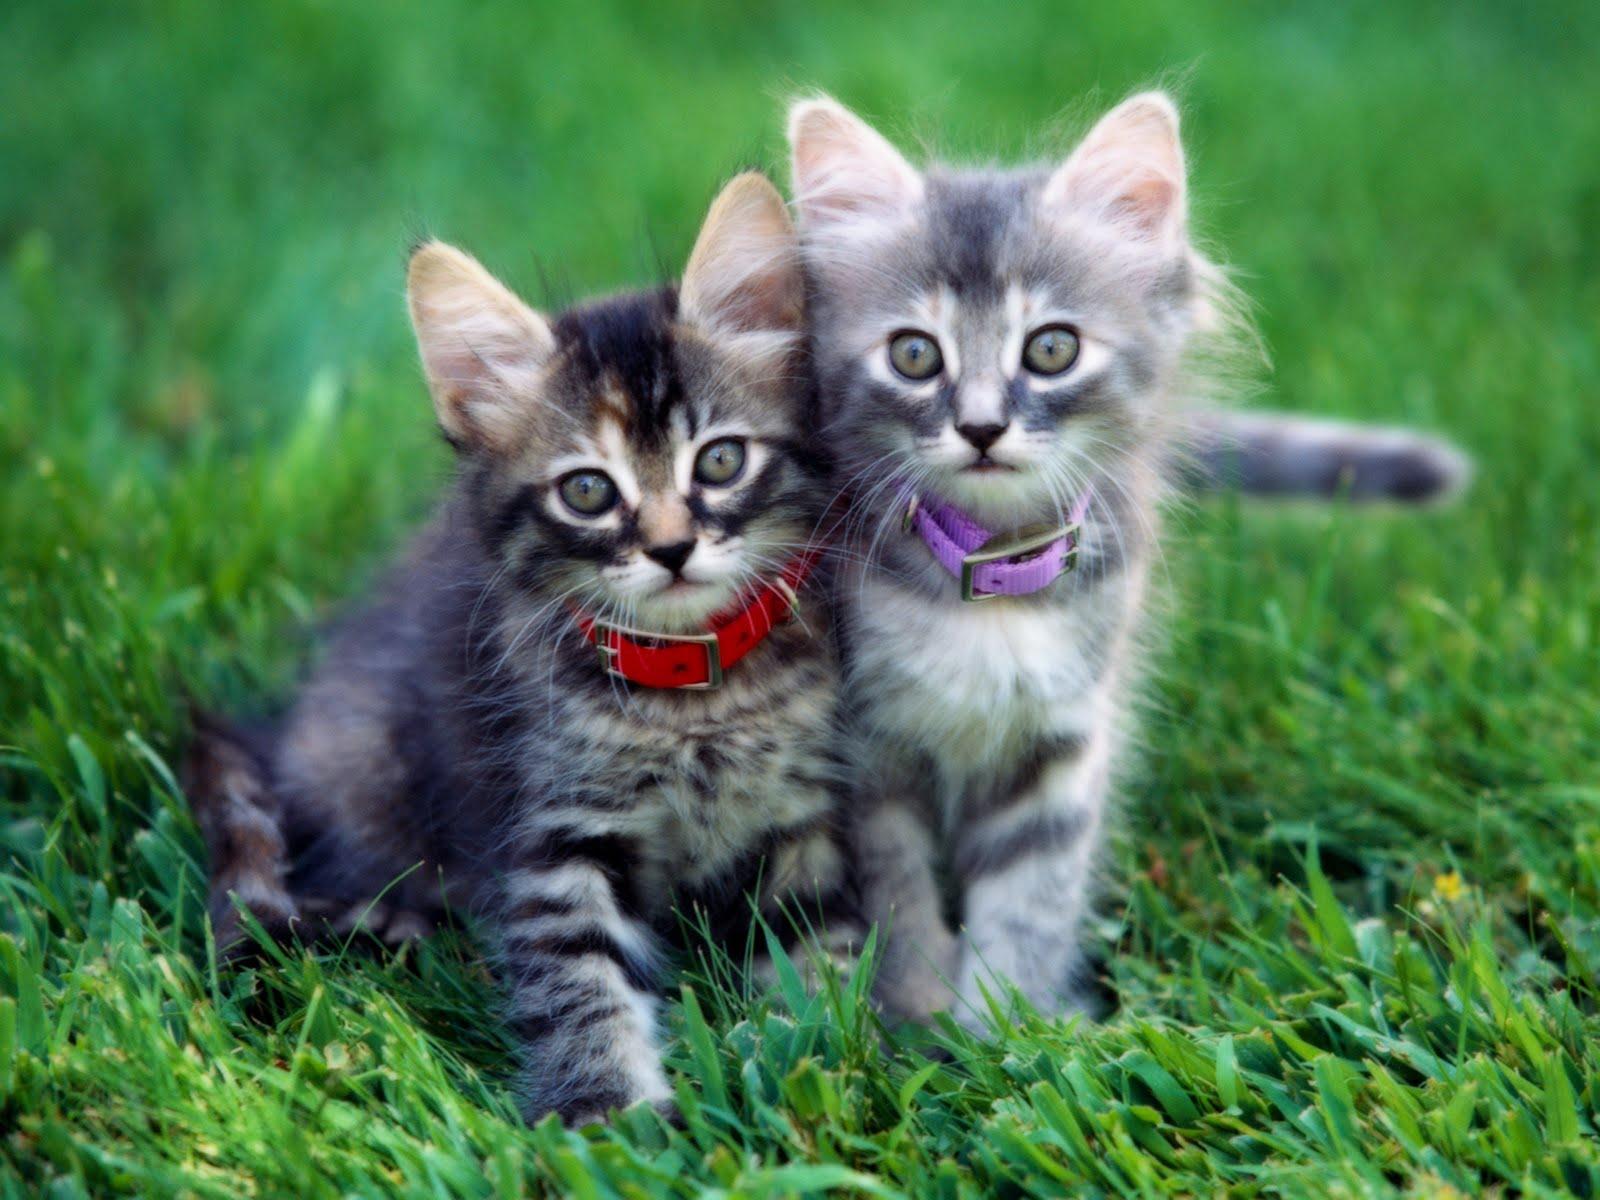 HD Wallpaper of Cute Cat | HD Wallpapers